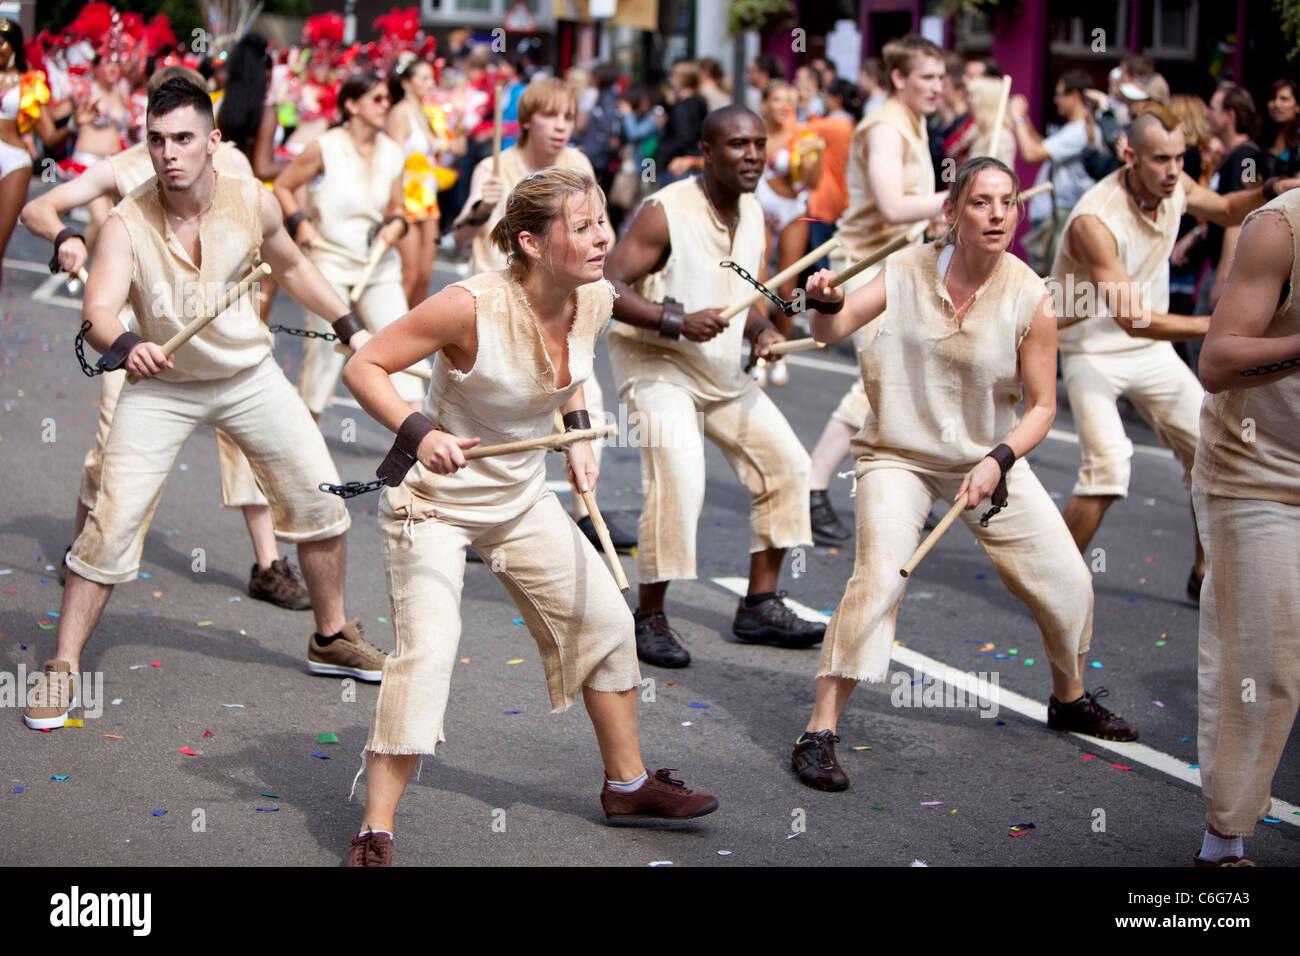 Samba school dancers at The Notting HIll Carnival 2011, London, England, UK, GB. - Stock Image